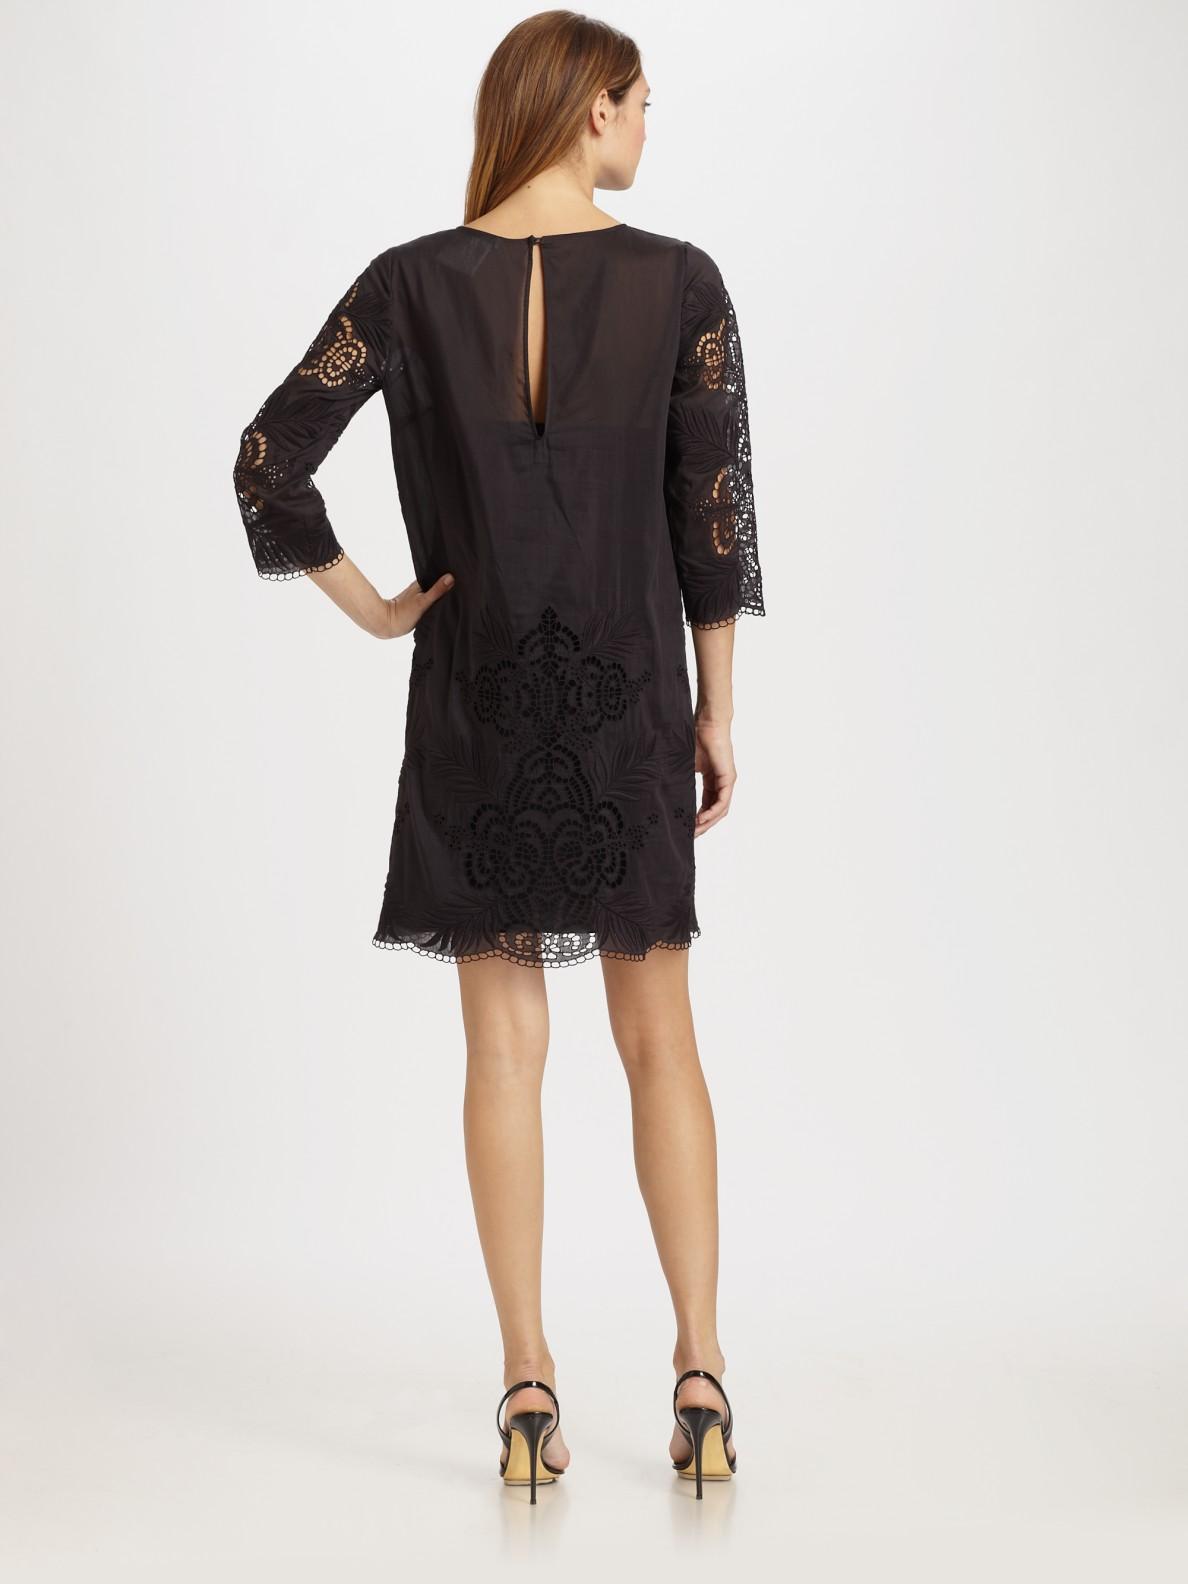 Black Eyelet Dress